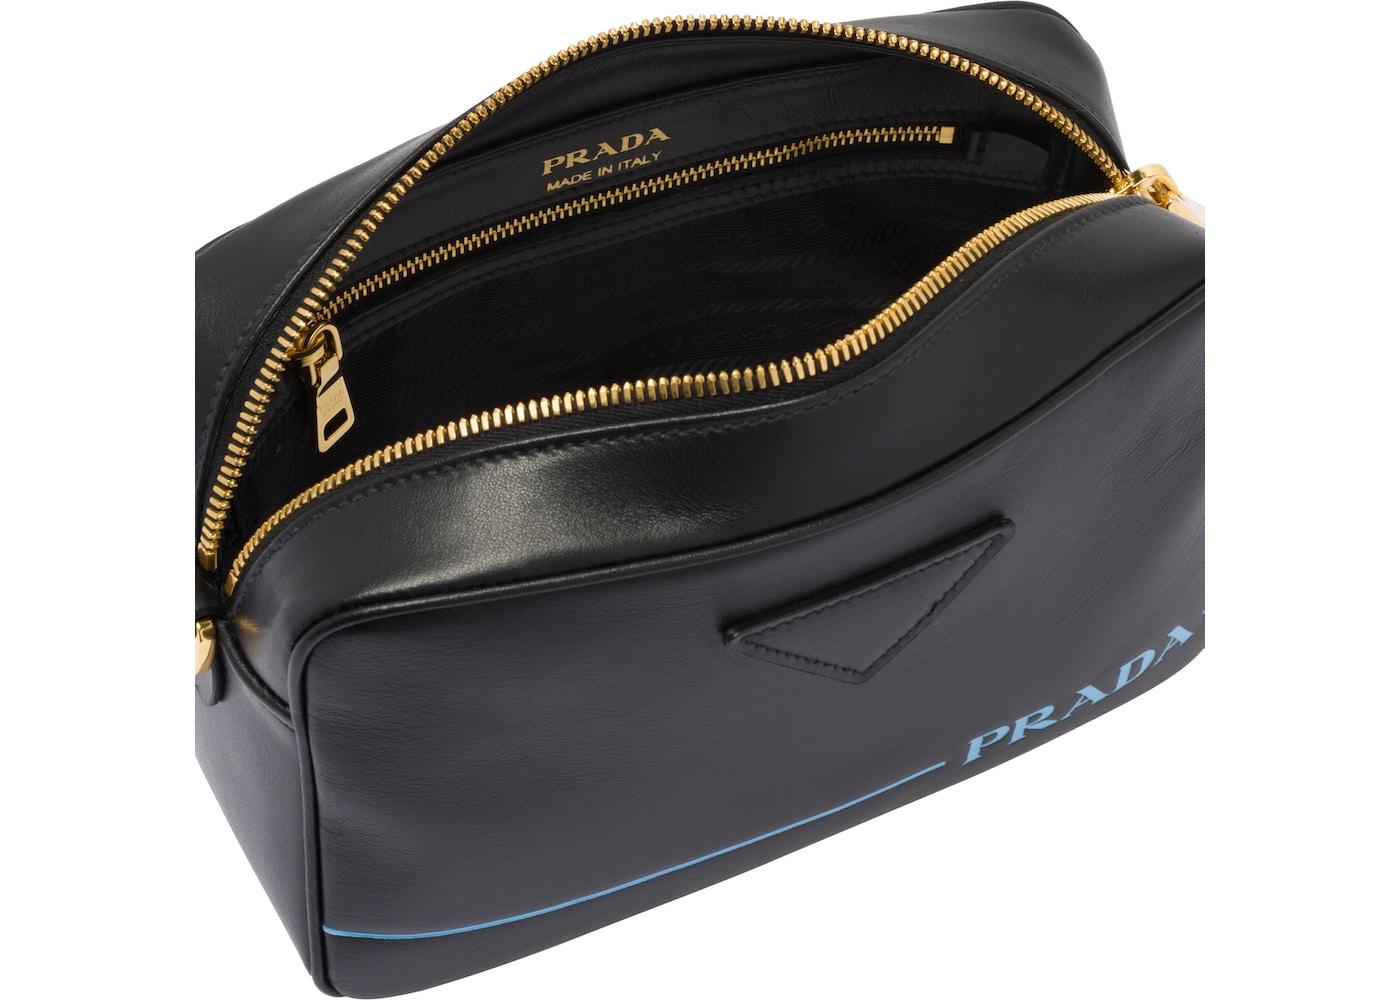 860b6bc8b1e65c Prada Shoulder Bag Mirage Leather Black